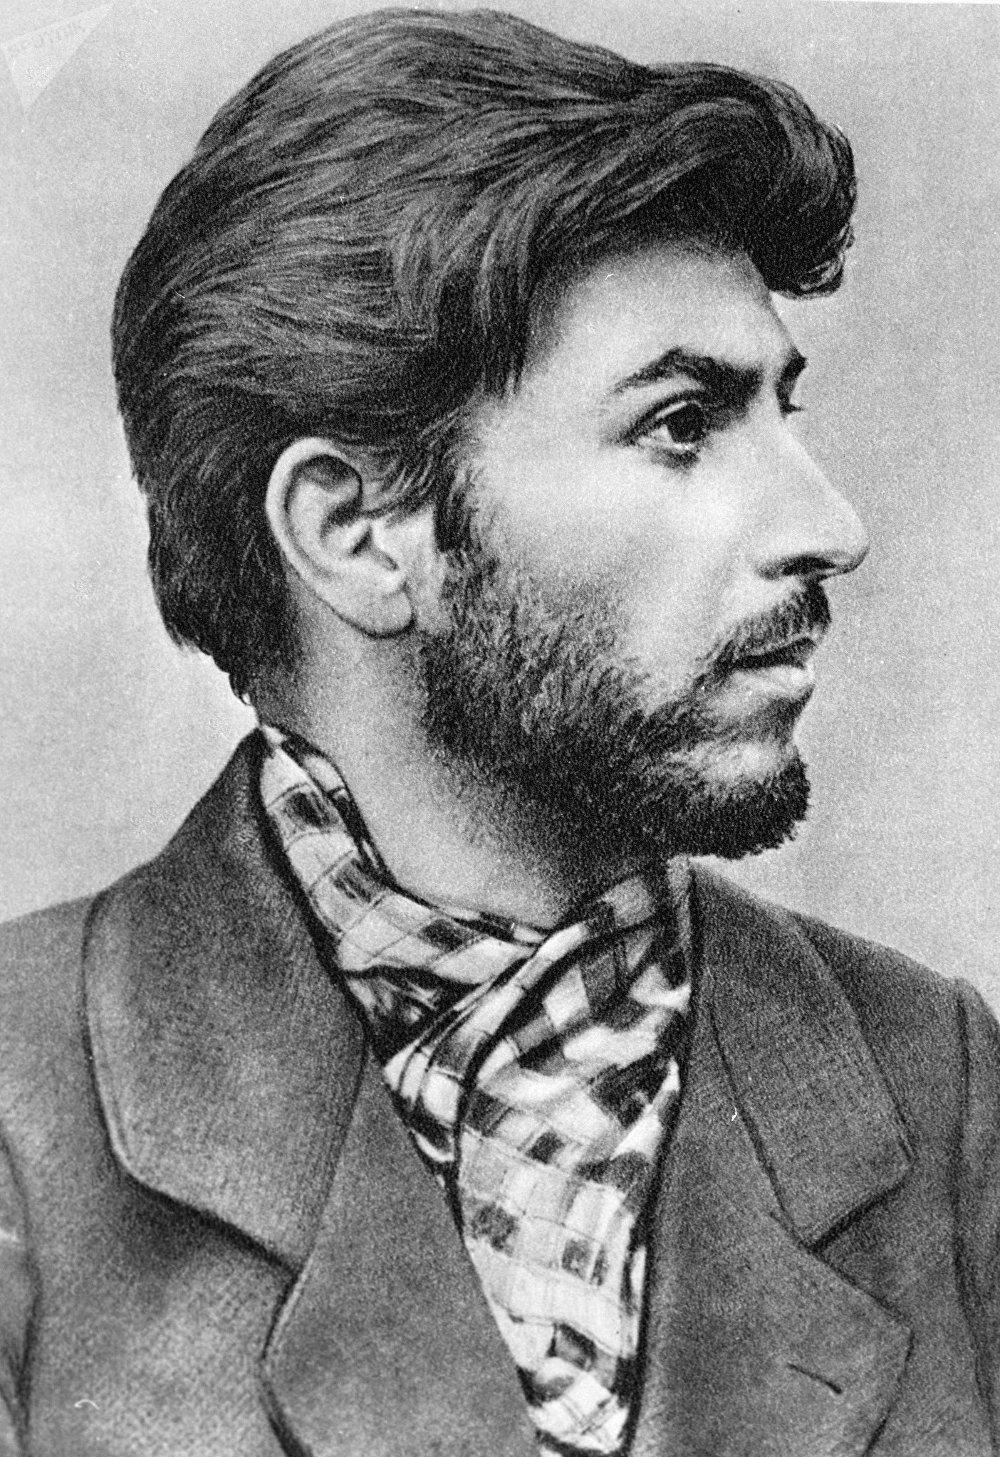 Iósif Dzugashvili / Stalin